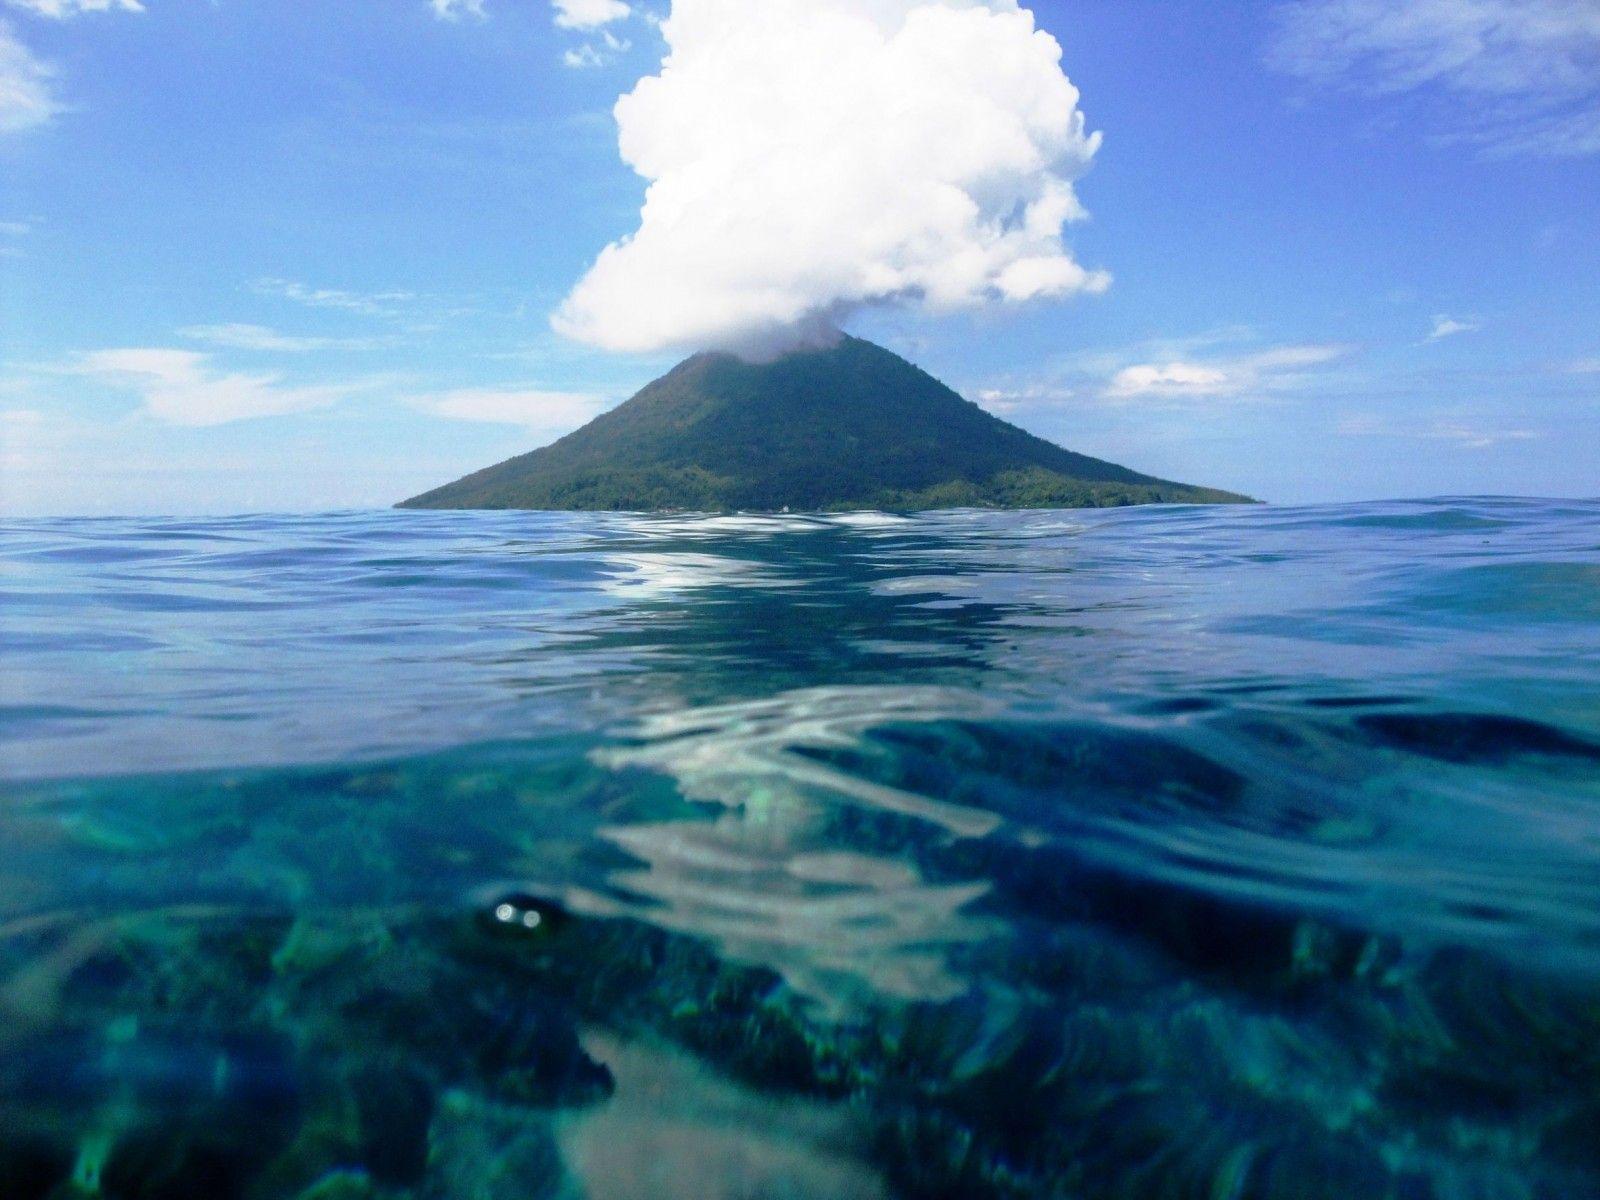 a-volcanic-island-in-manado-indonesia-1600x1200.jpg (1600 ...